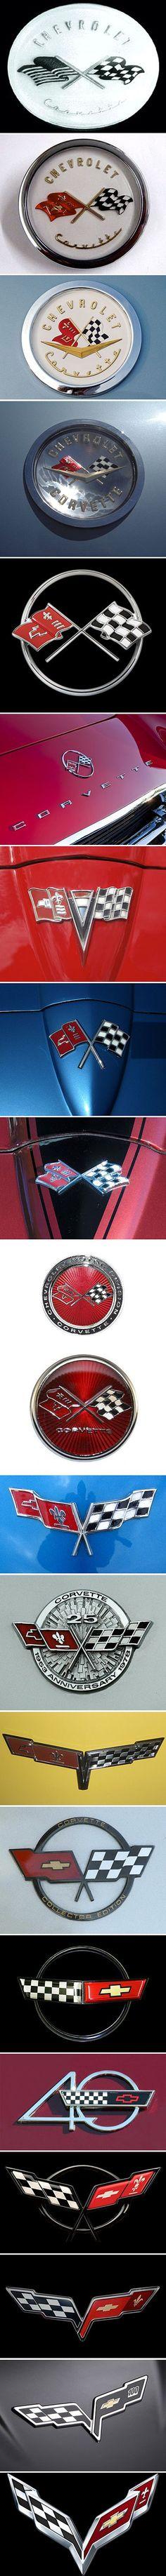 A Visual History of Corvette Logos #chevroletcorvettevintage